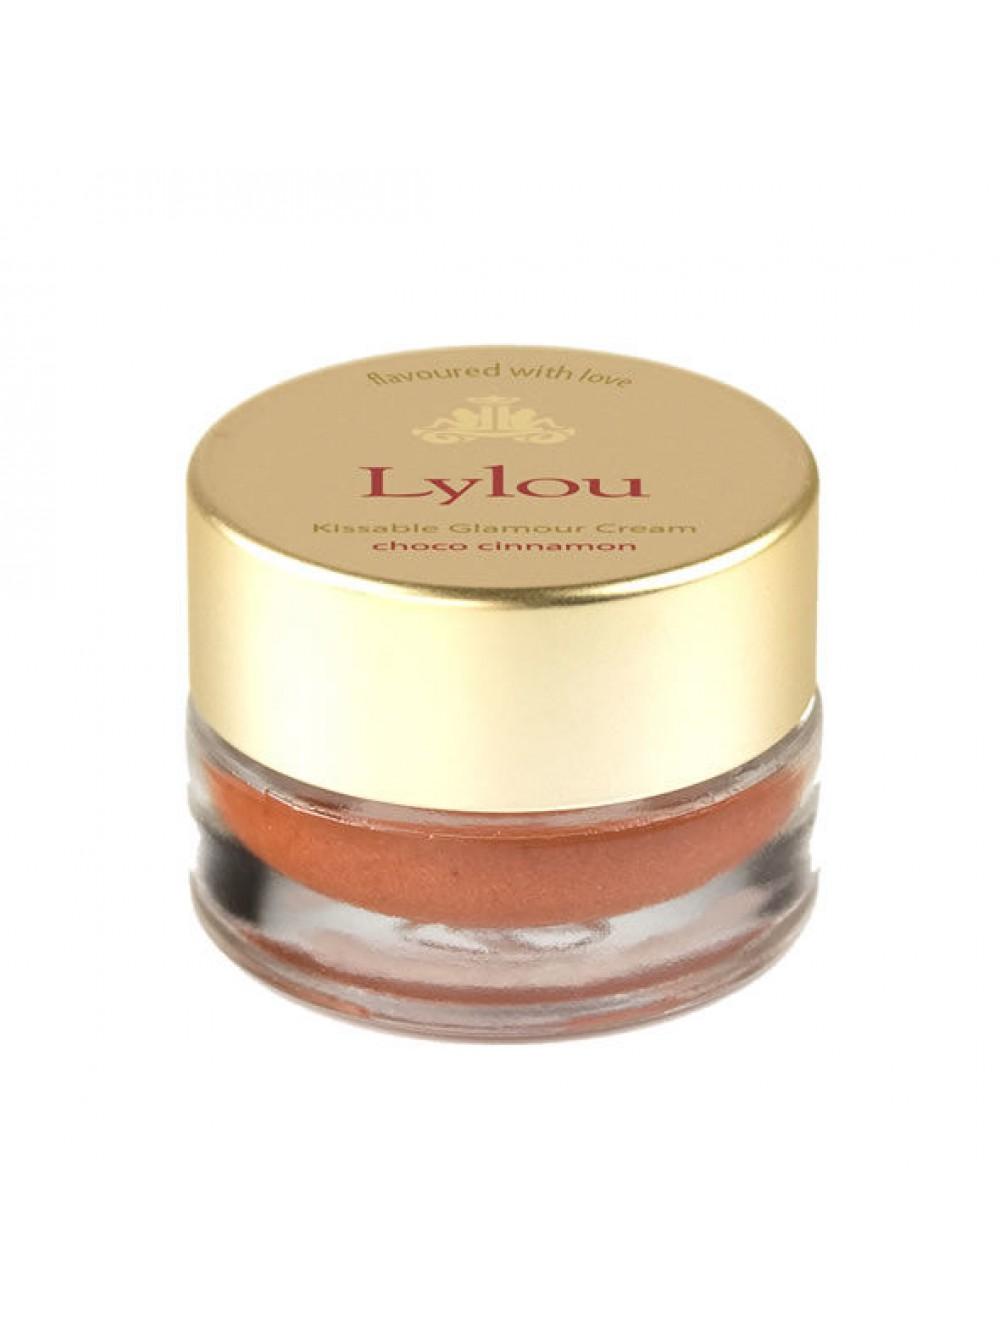 LYLOU KISSABLE GLAMOUR CREAM CHOCO CINNAMON 7ML